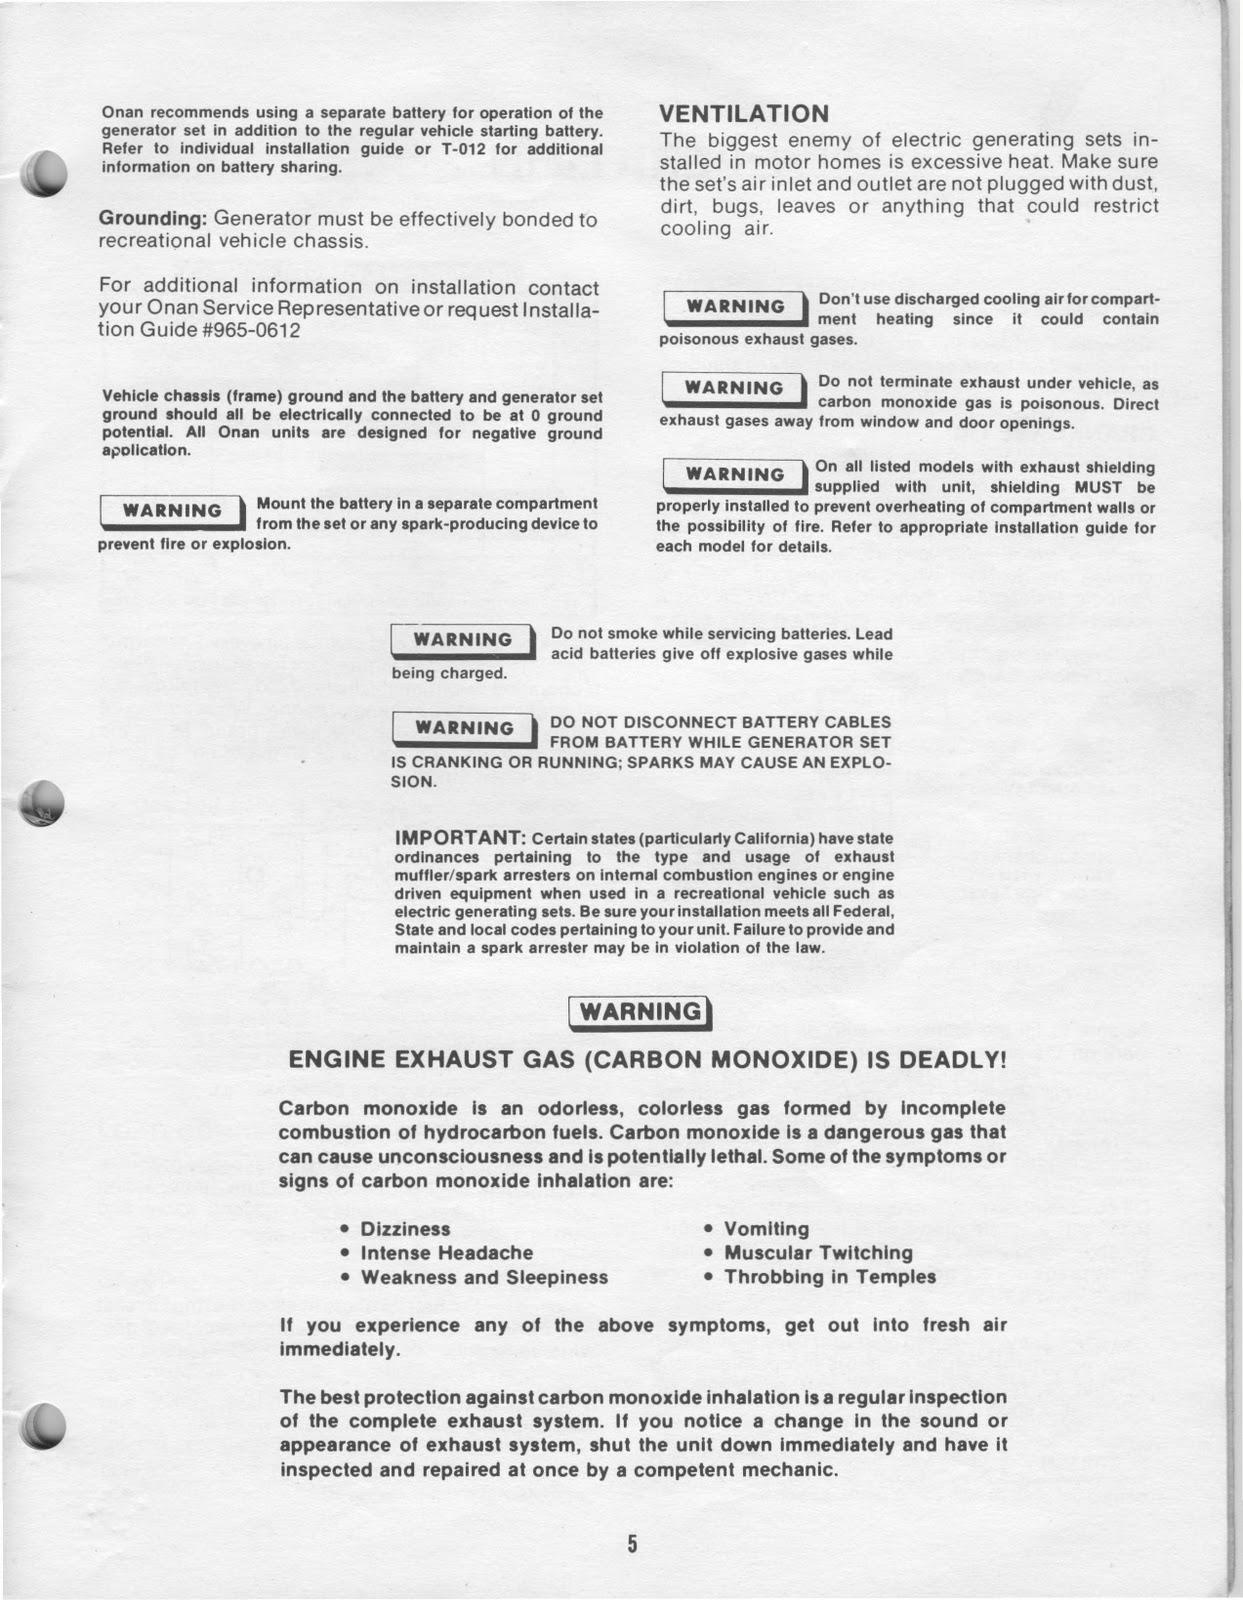 wiring diagram onan generator wiring image 1983 fleetwood pace arrow owners manuals onan 4 0 kw [ 1243 x 1600 Pixel ]